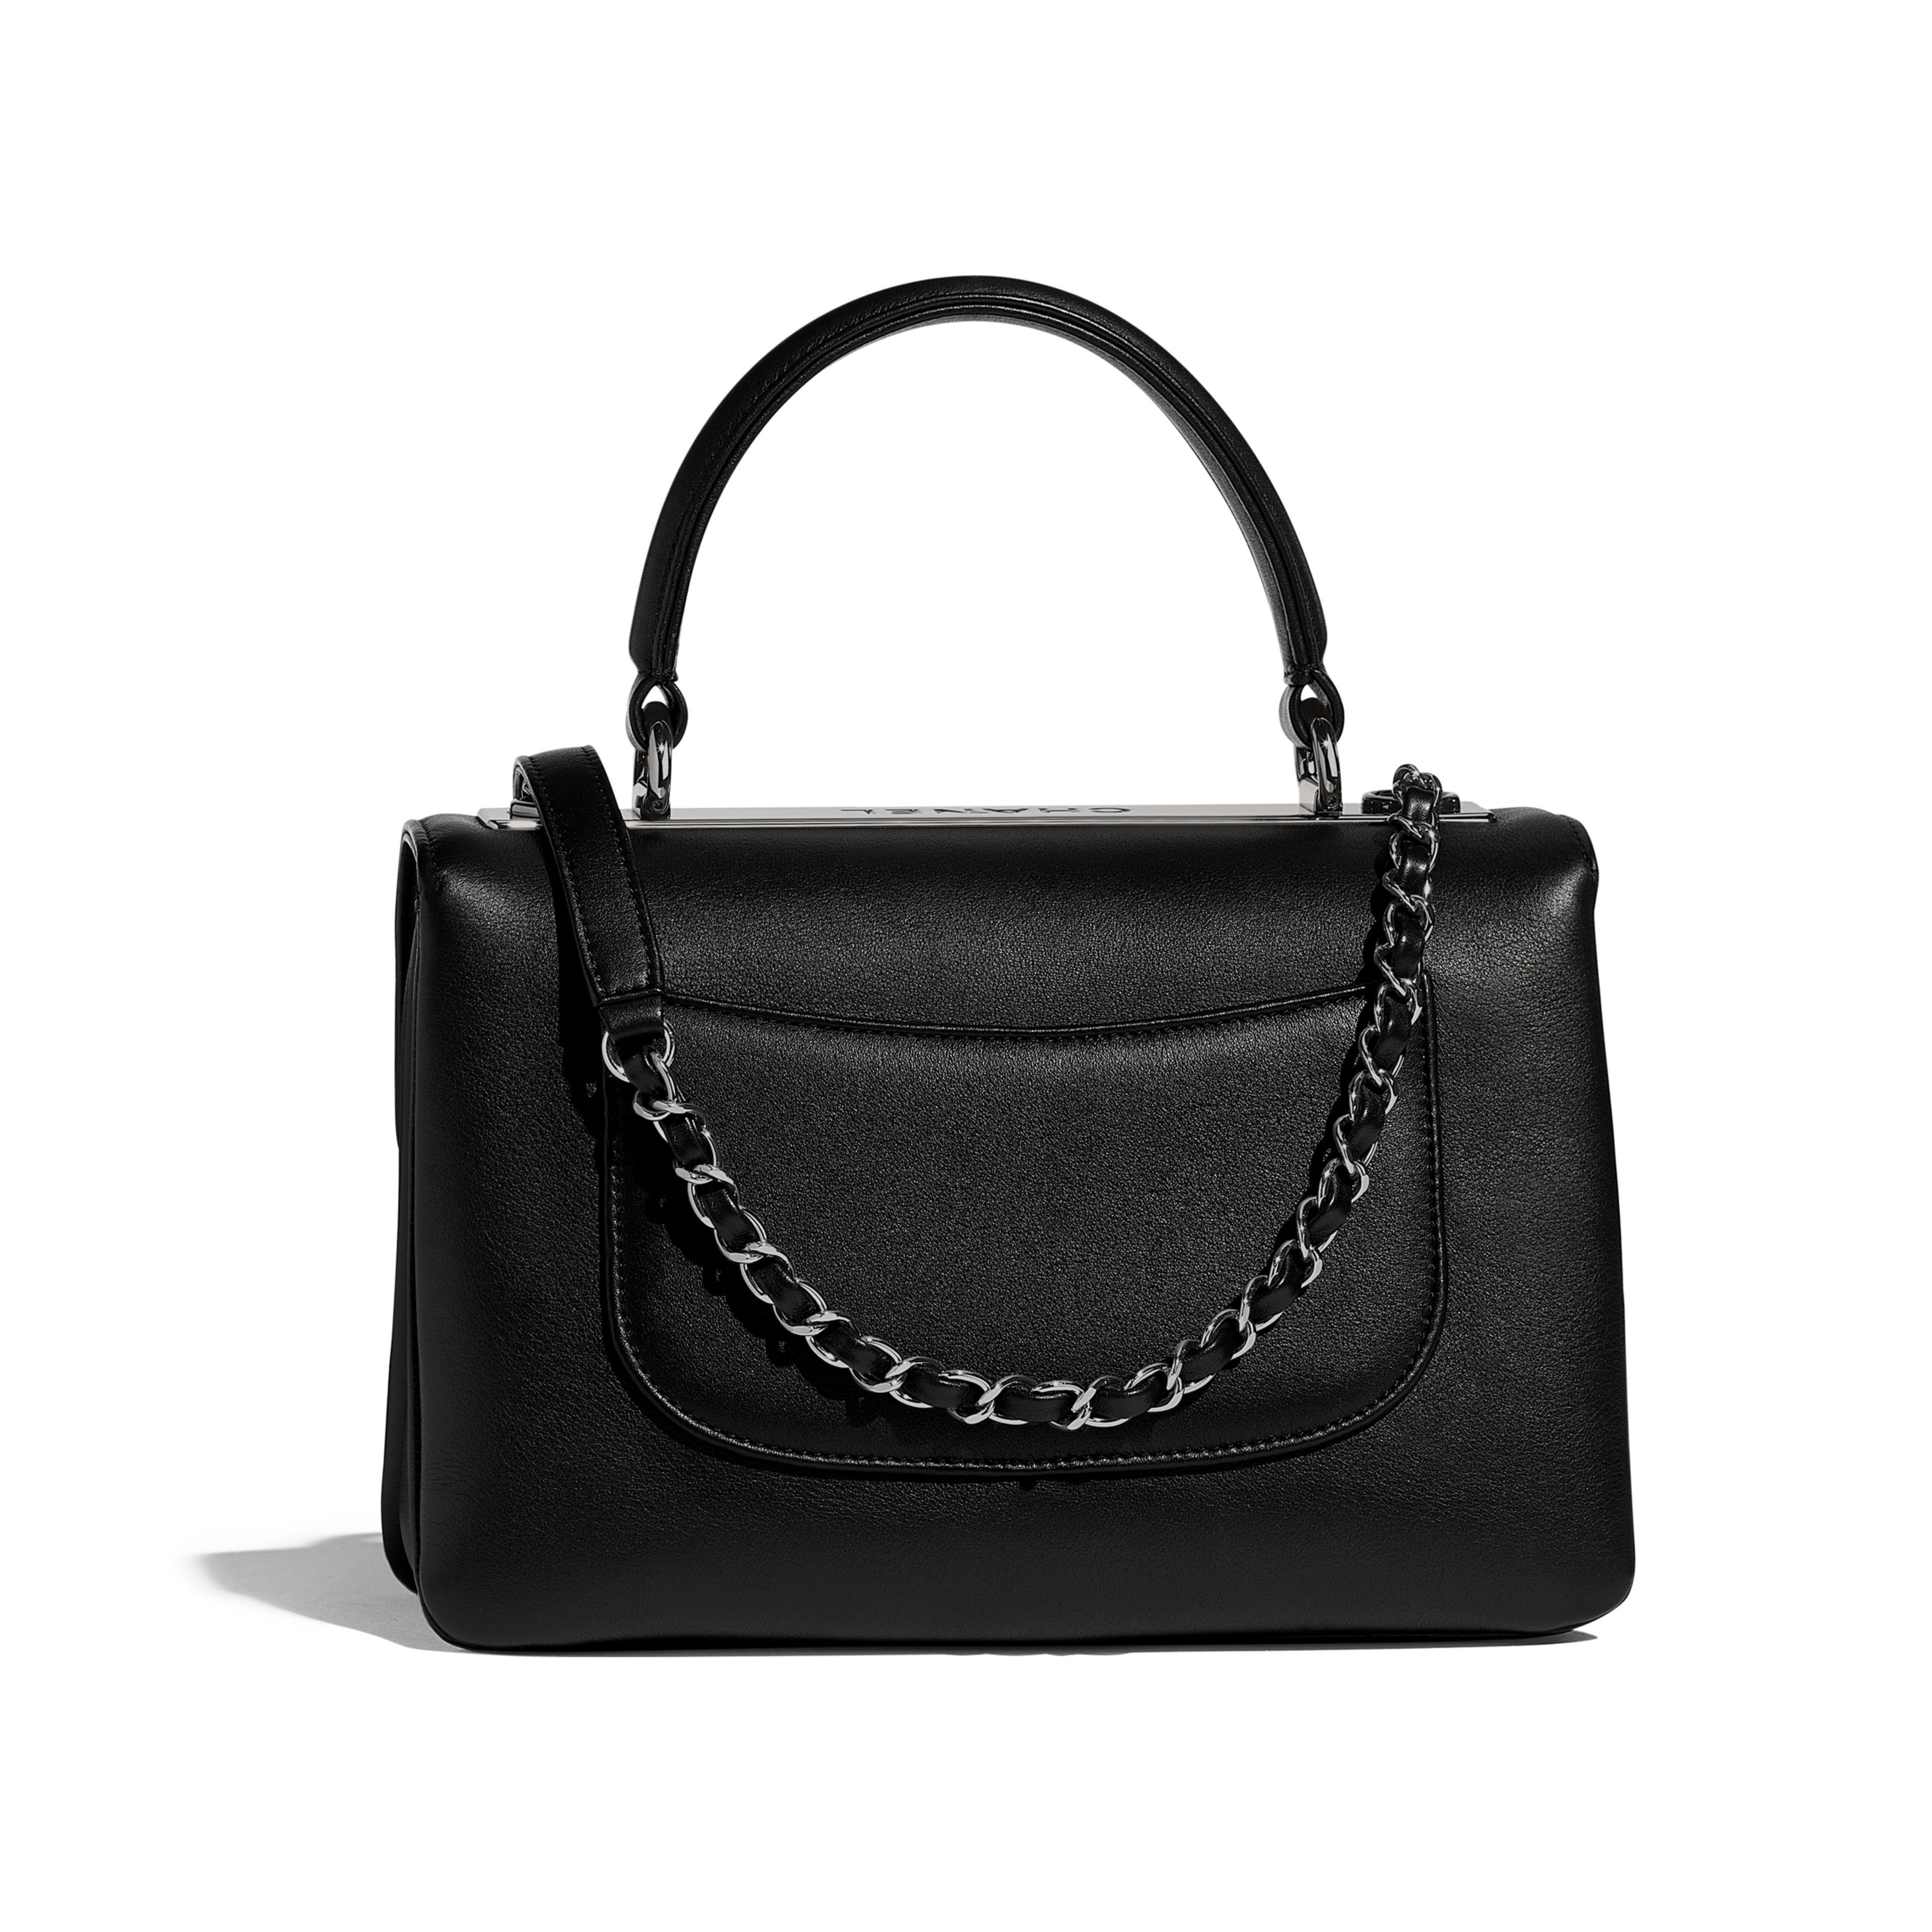 Small Flap Bag with Top Handle - Black - Calfskin   Ruthenium-Finish Metal  ... c2bc217cdd